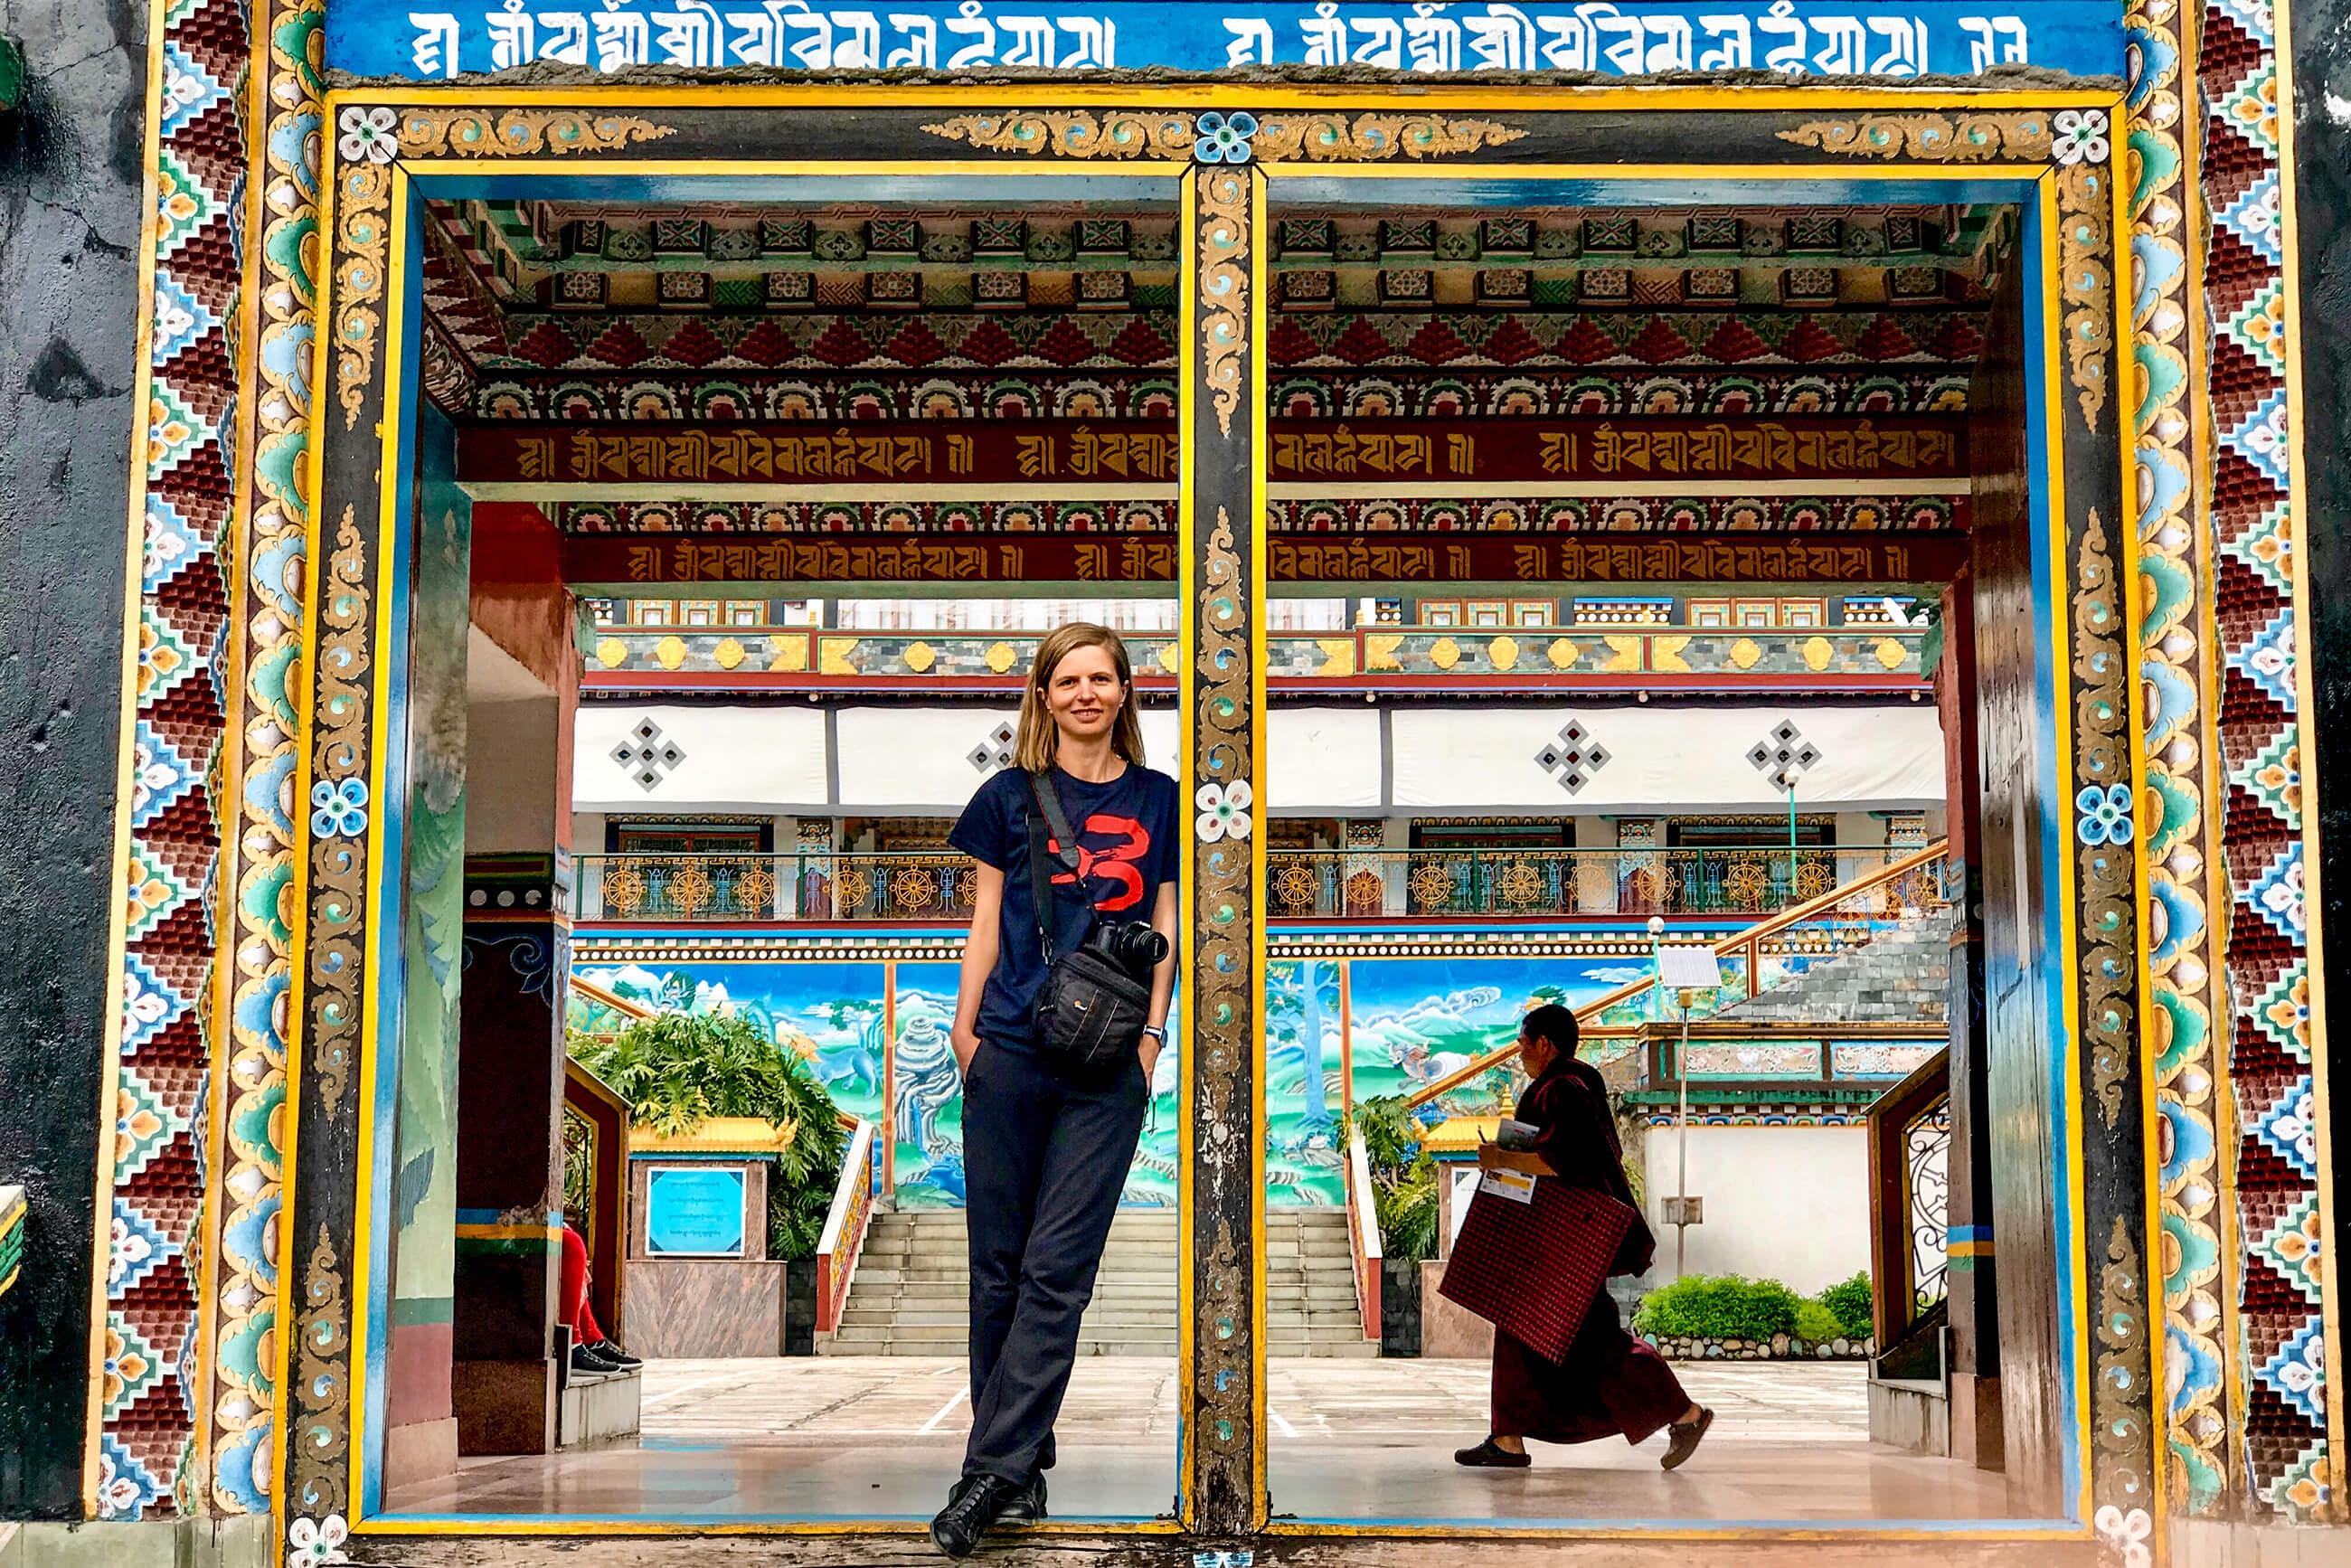 https://bubo.sk/uploads/galleries/4914/roberttaraba_bhutan-2.jpg